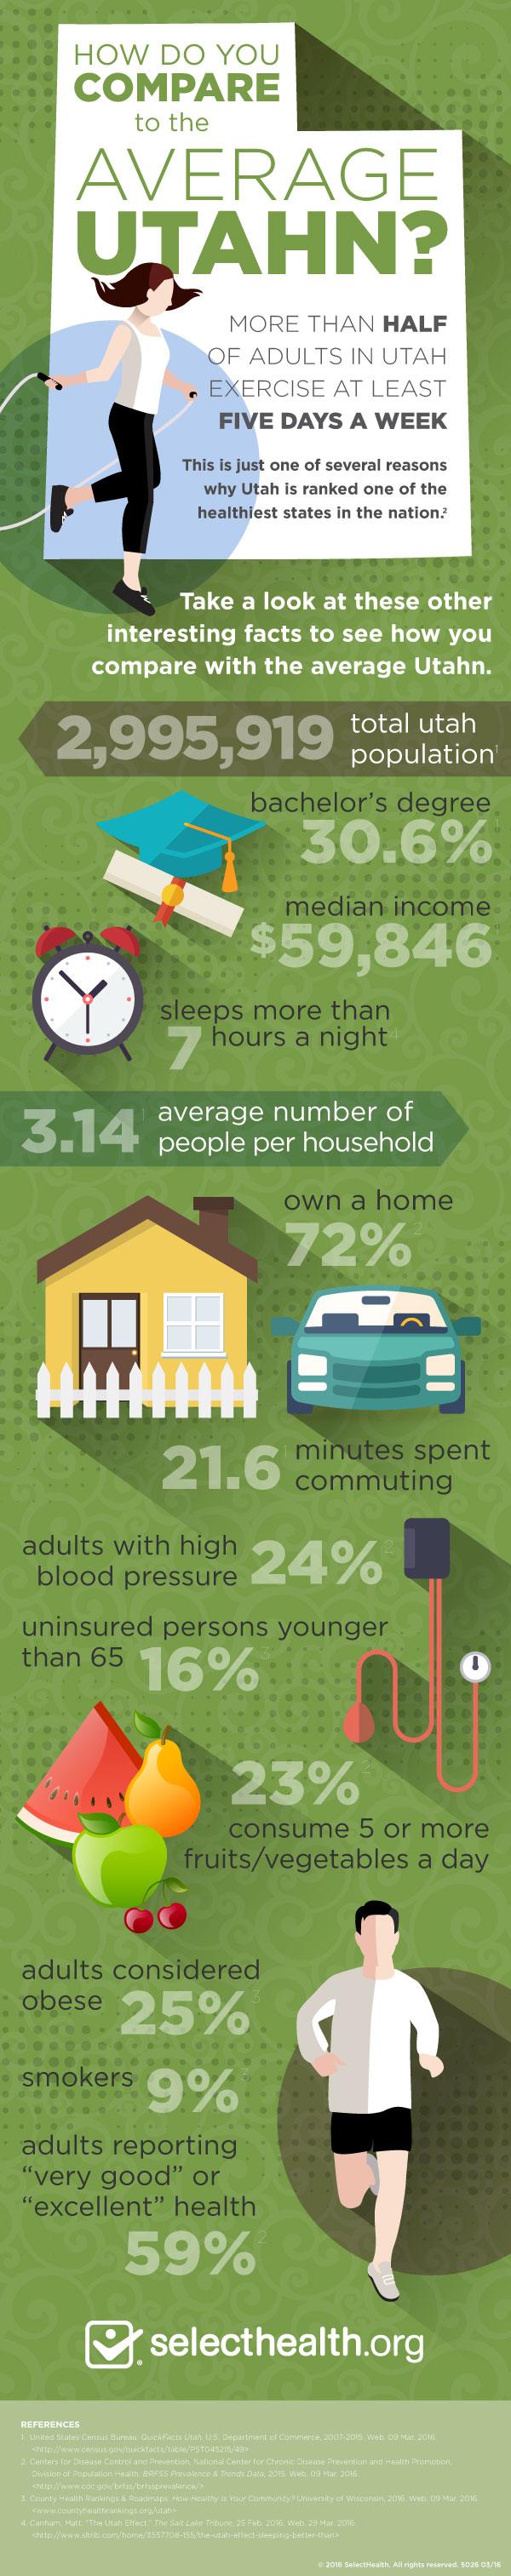 Average Utahn Infographic